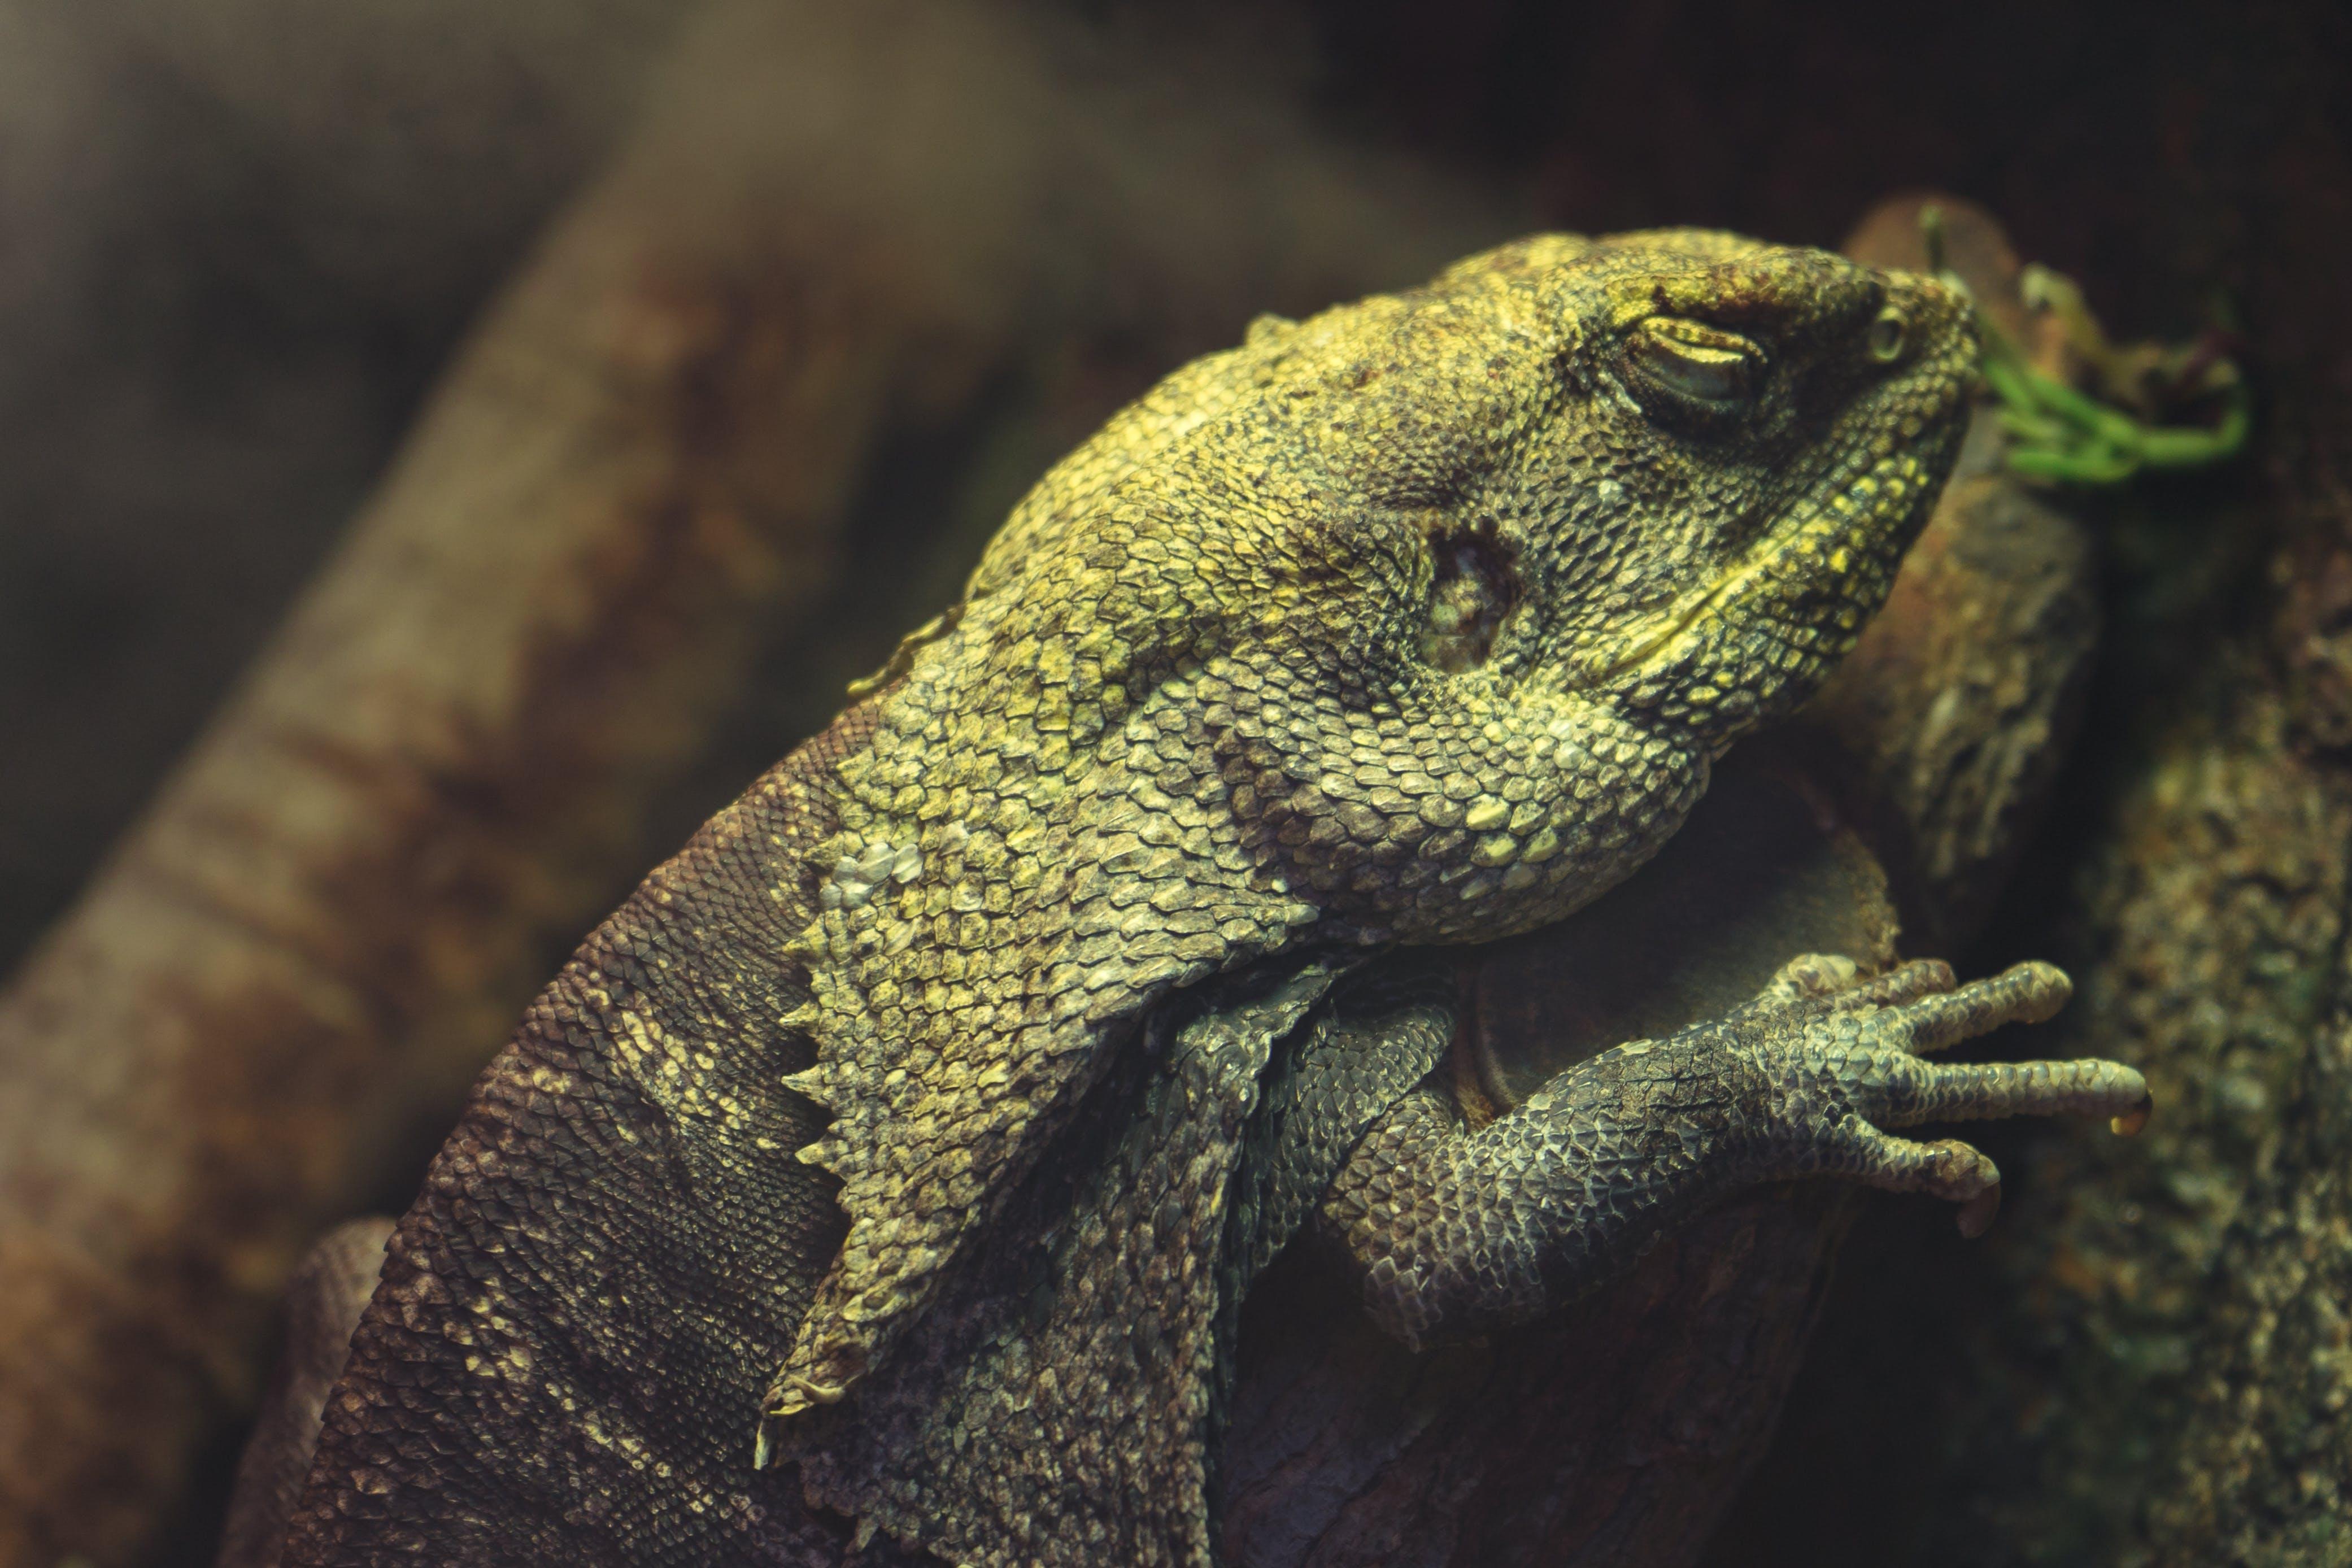 barevný, barva, chameleon